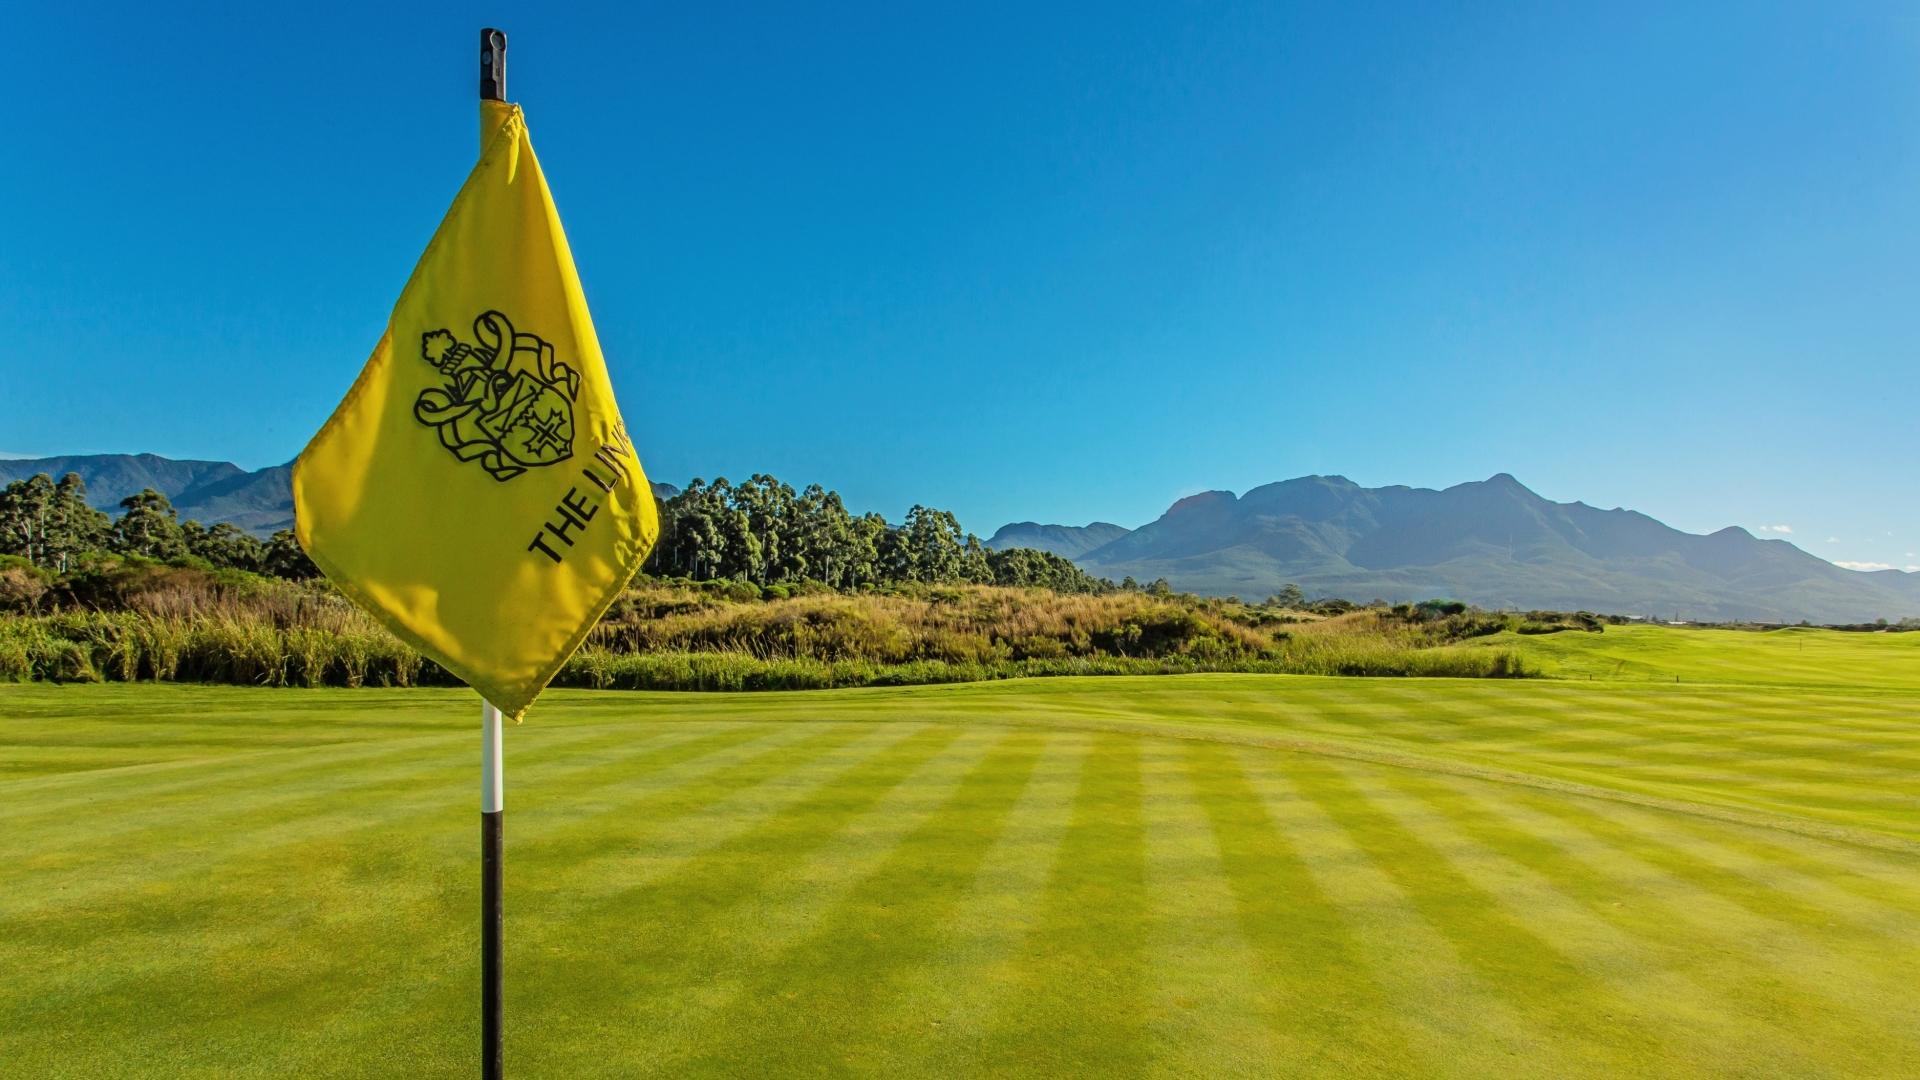 Fancourt Golf Course The Links Zuid-Afrika Vlag